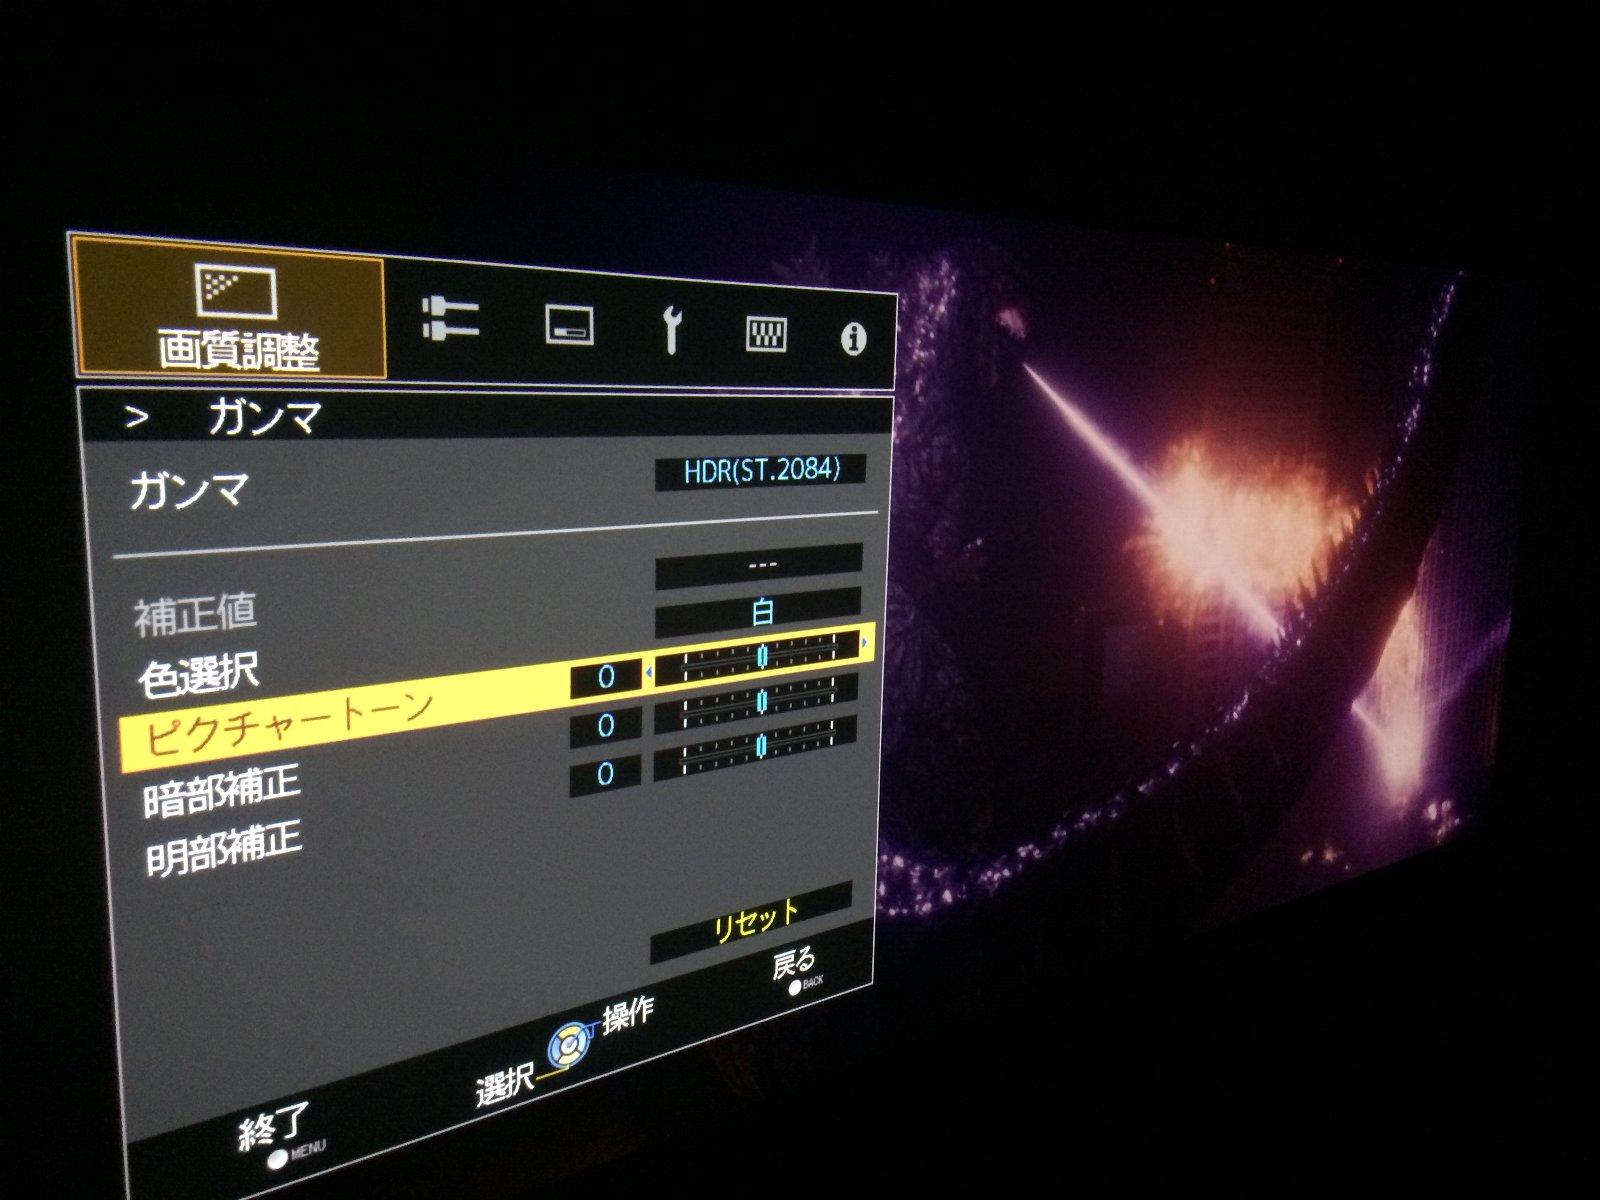 UHD-BD『シン・ゴジラ』ピクチャートーン0(標準)